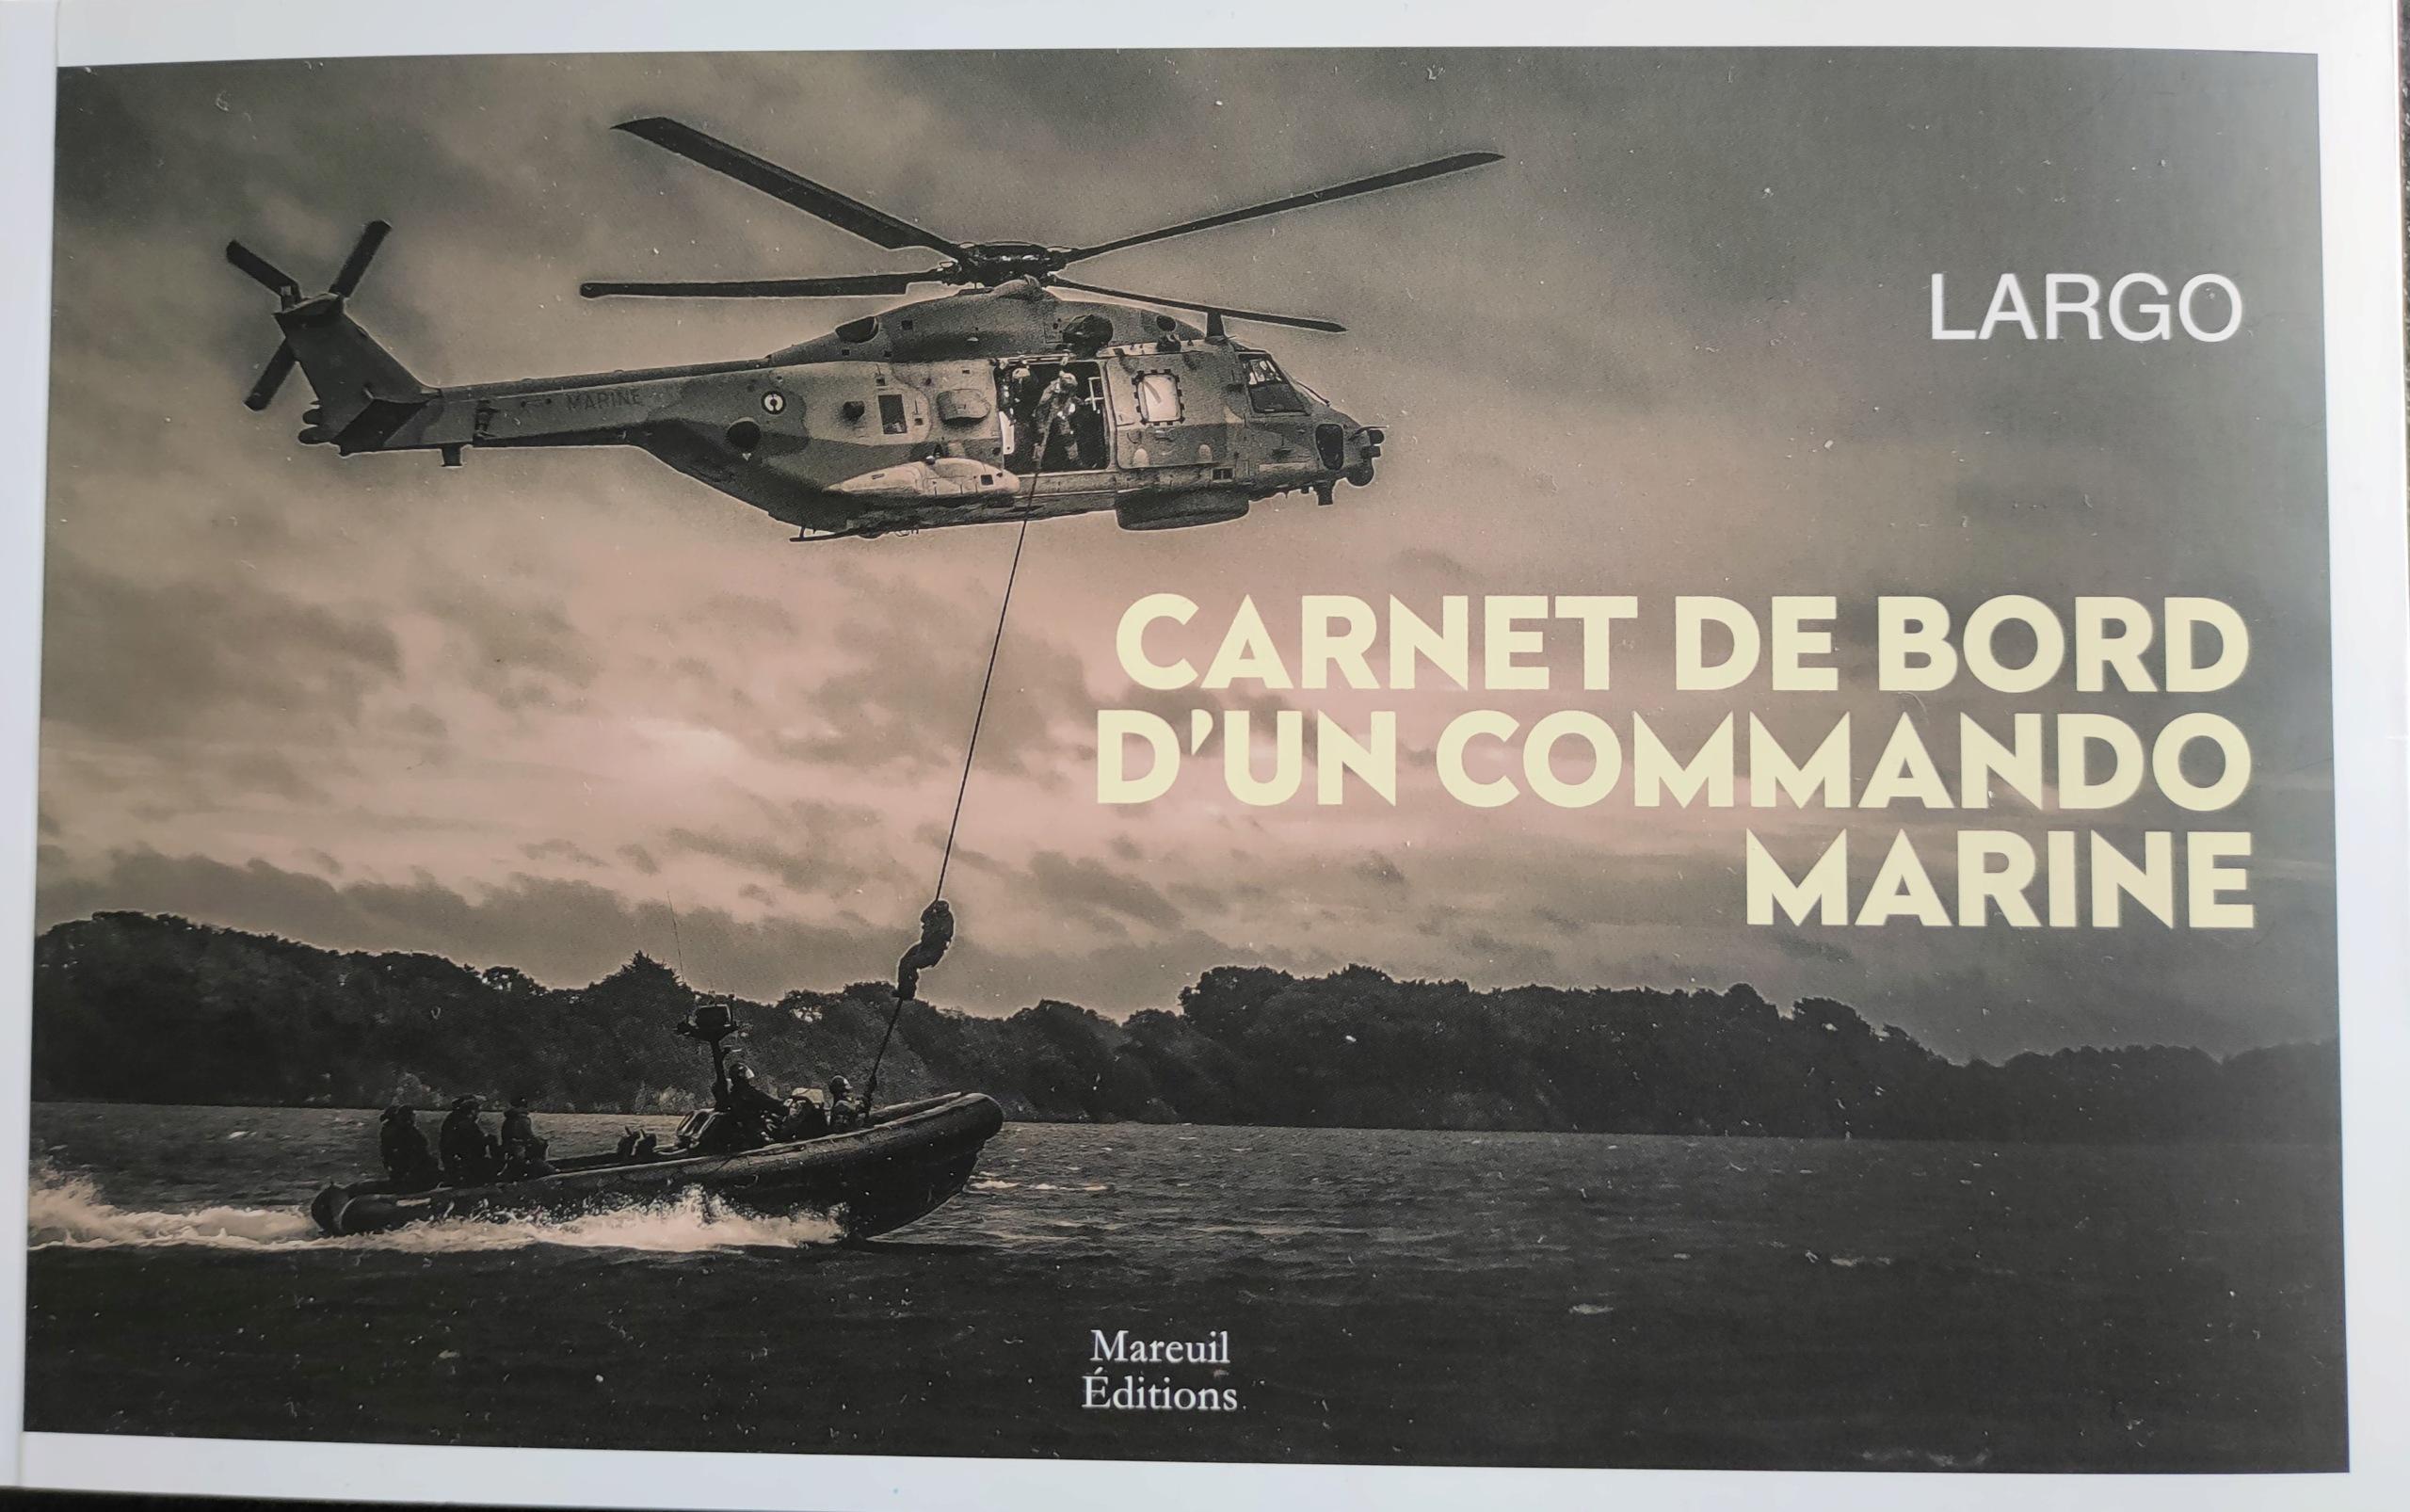 Carnet de bord d'un commando marine. Largo110